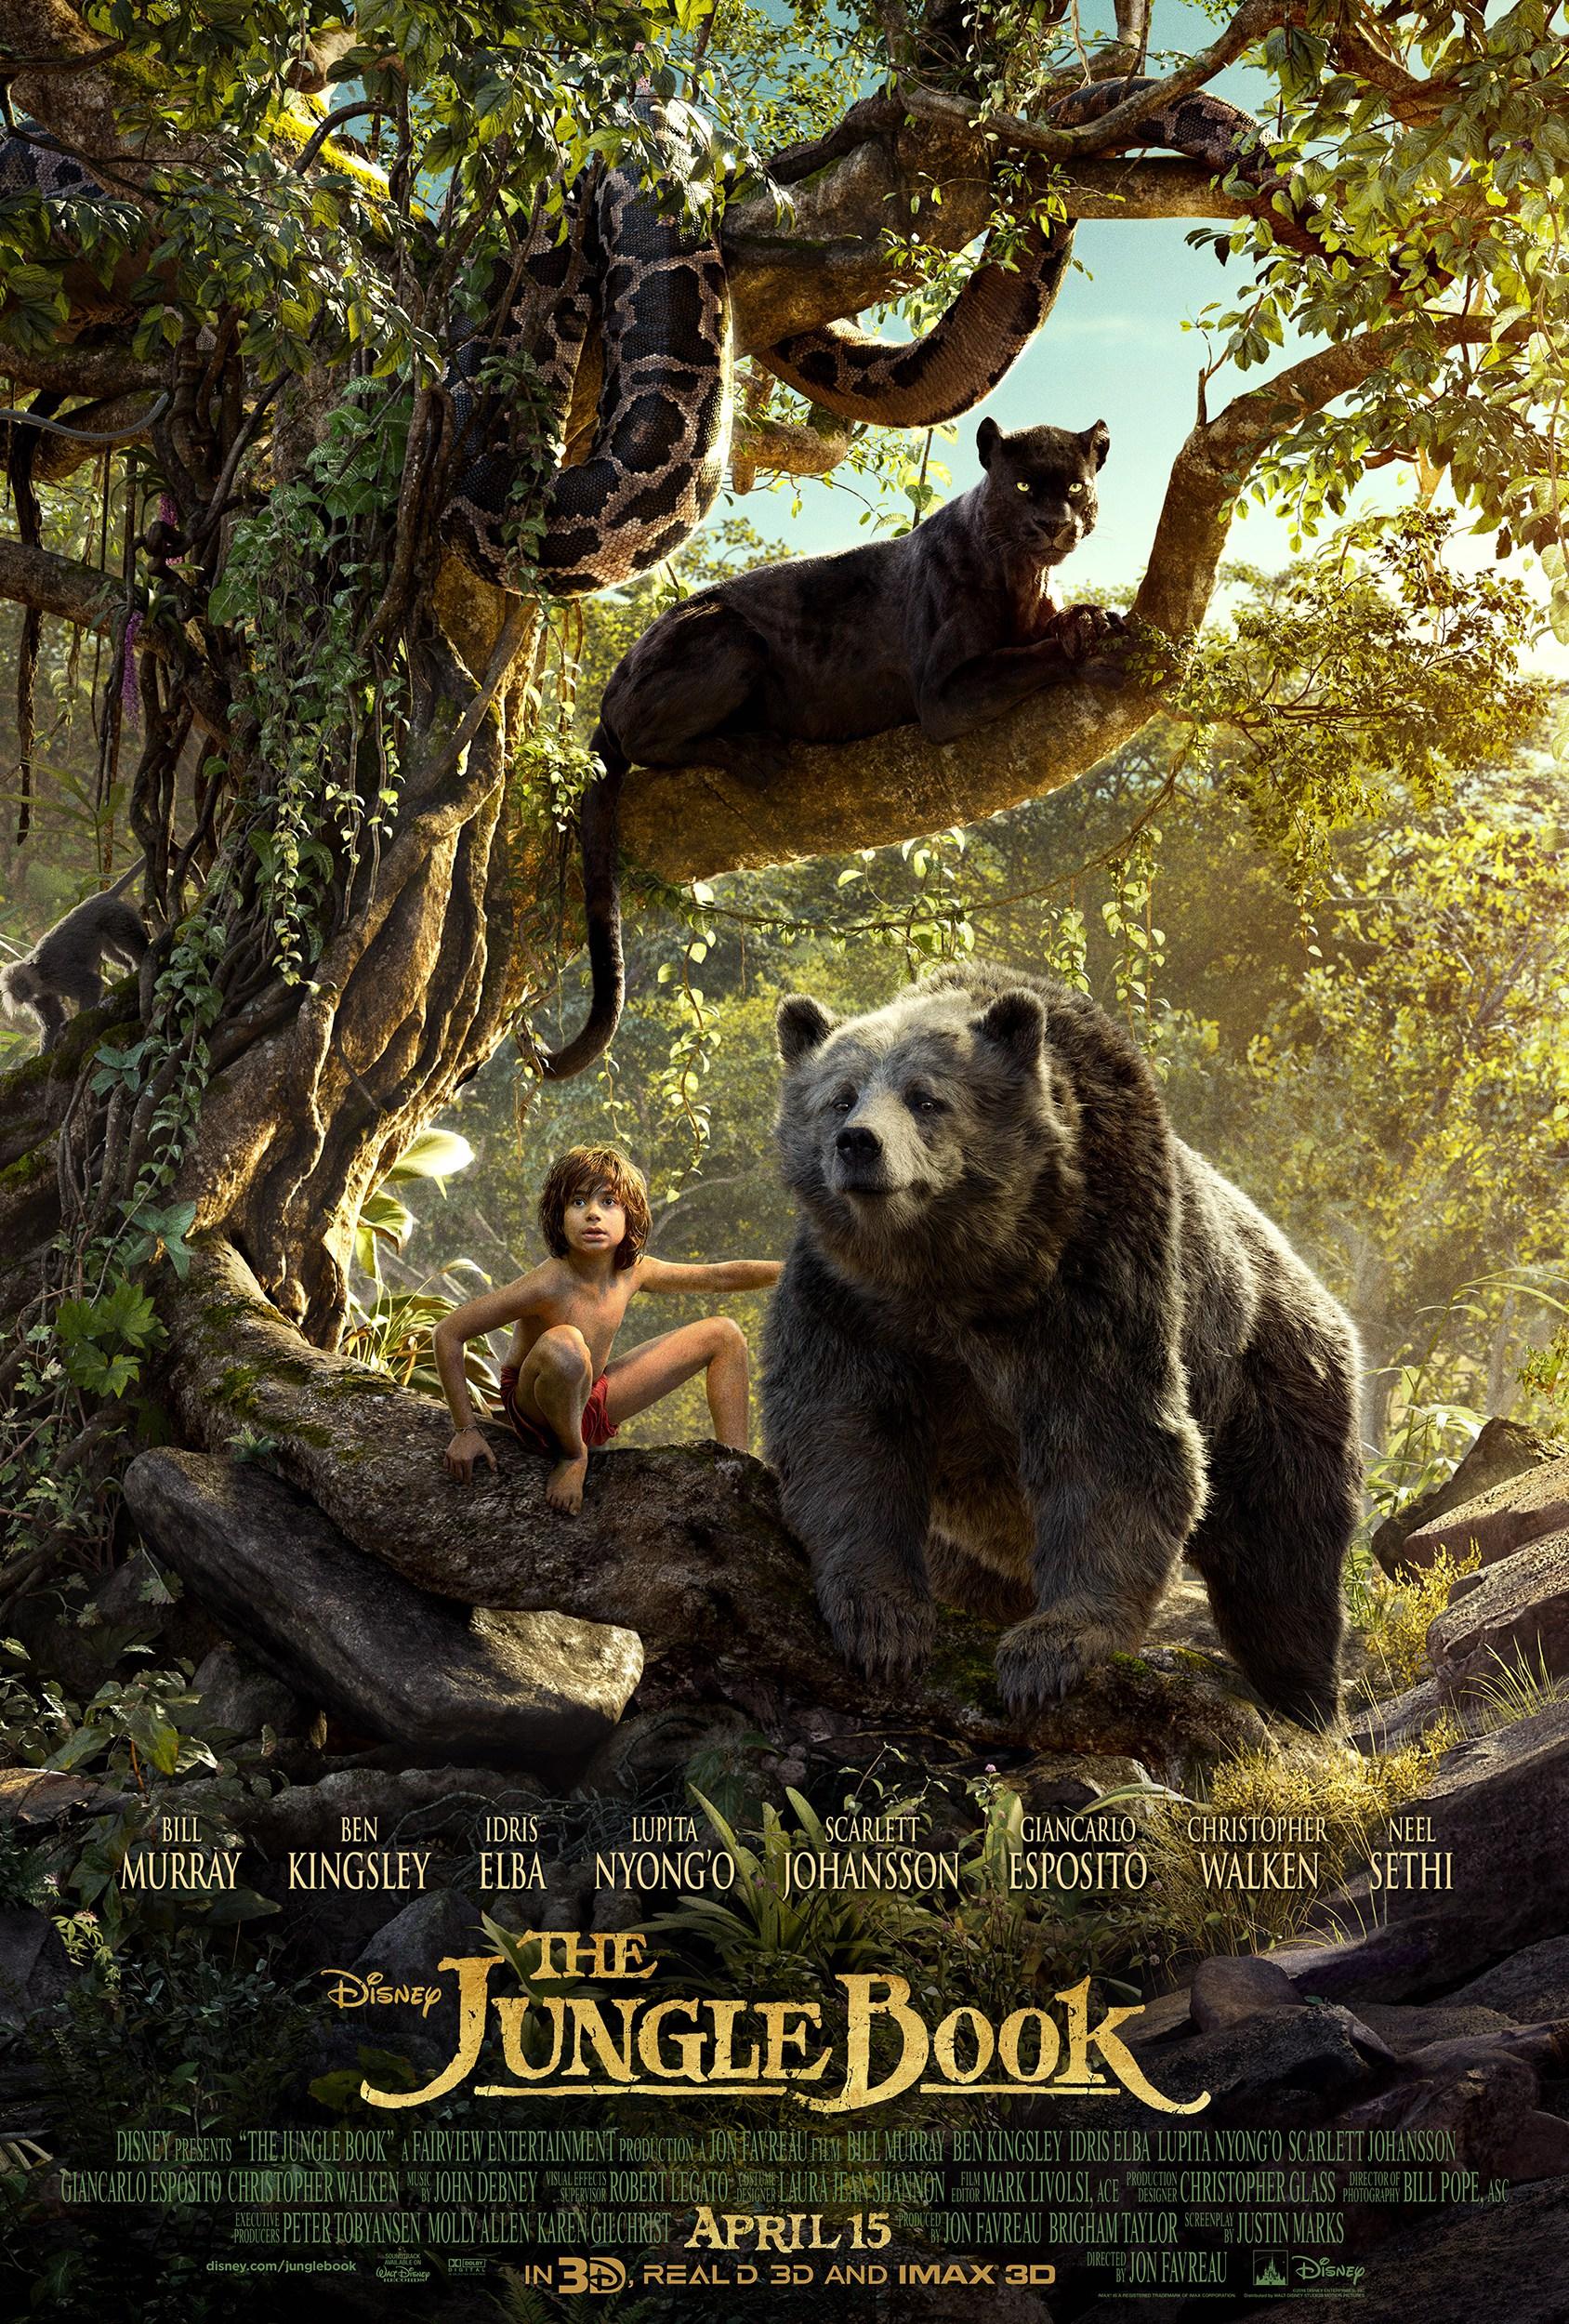 junglebookposter.jpg